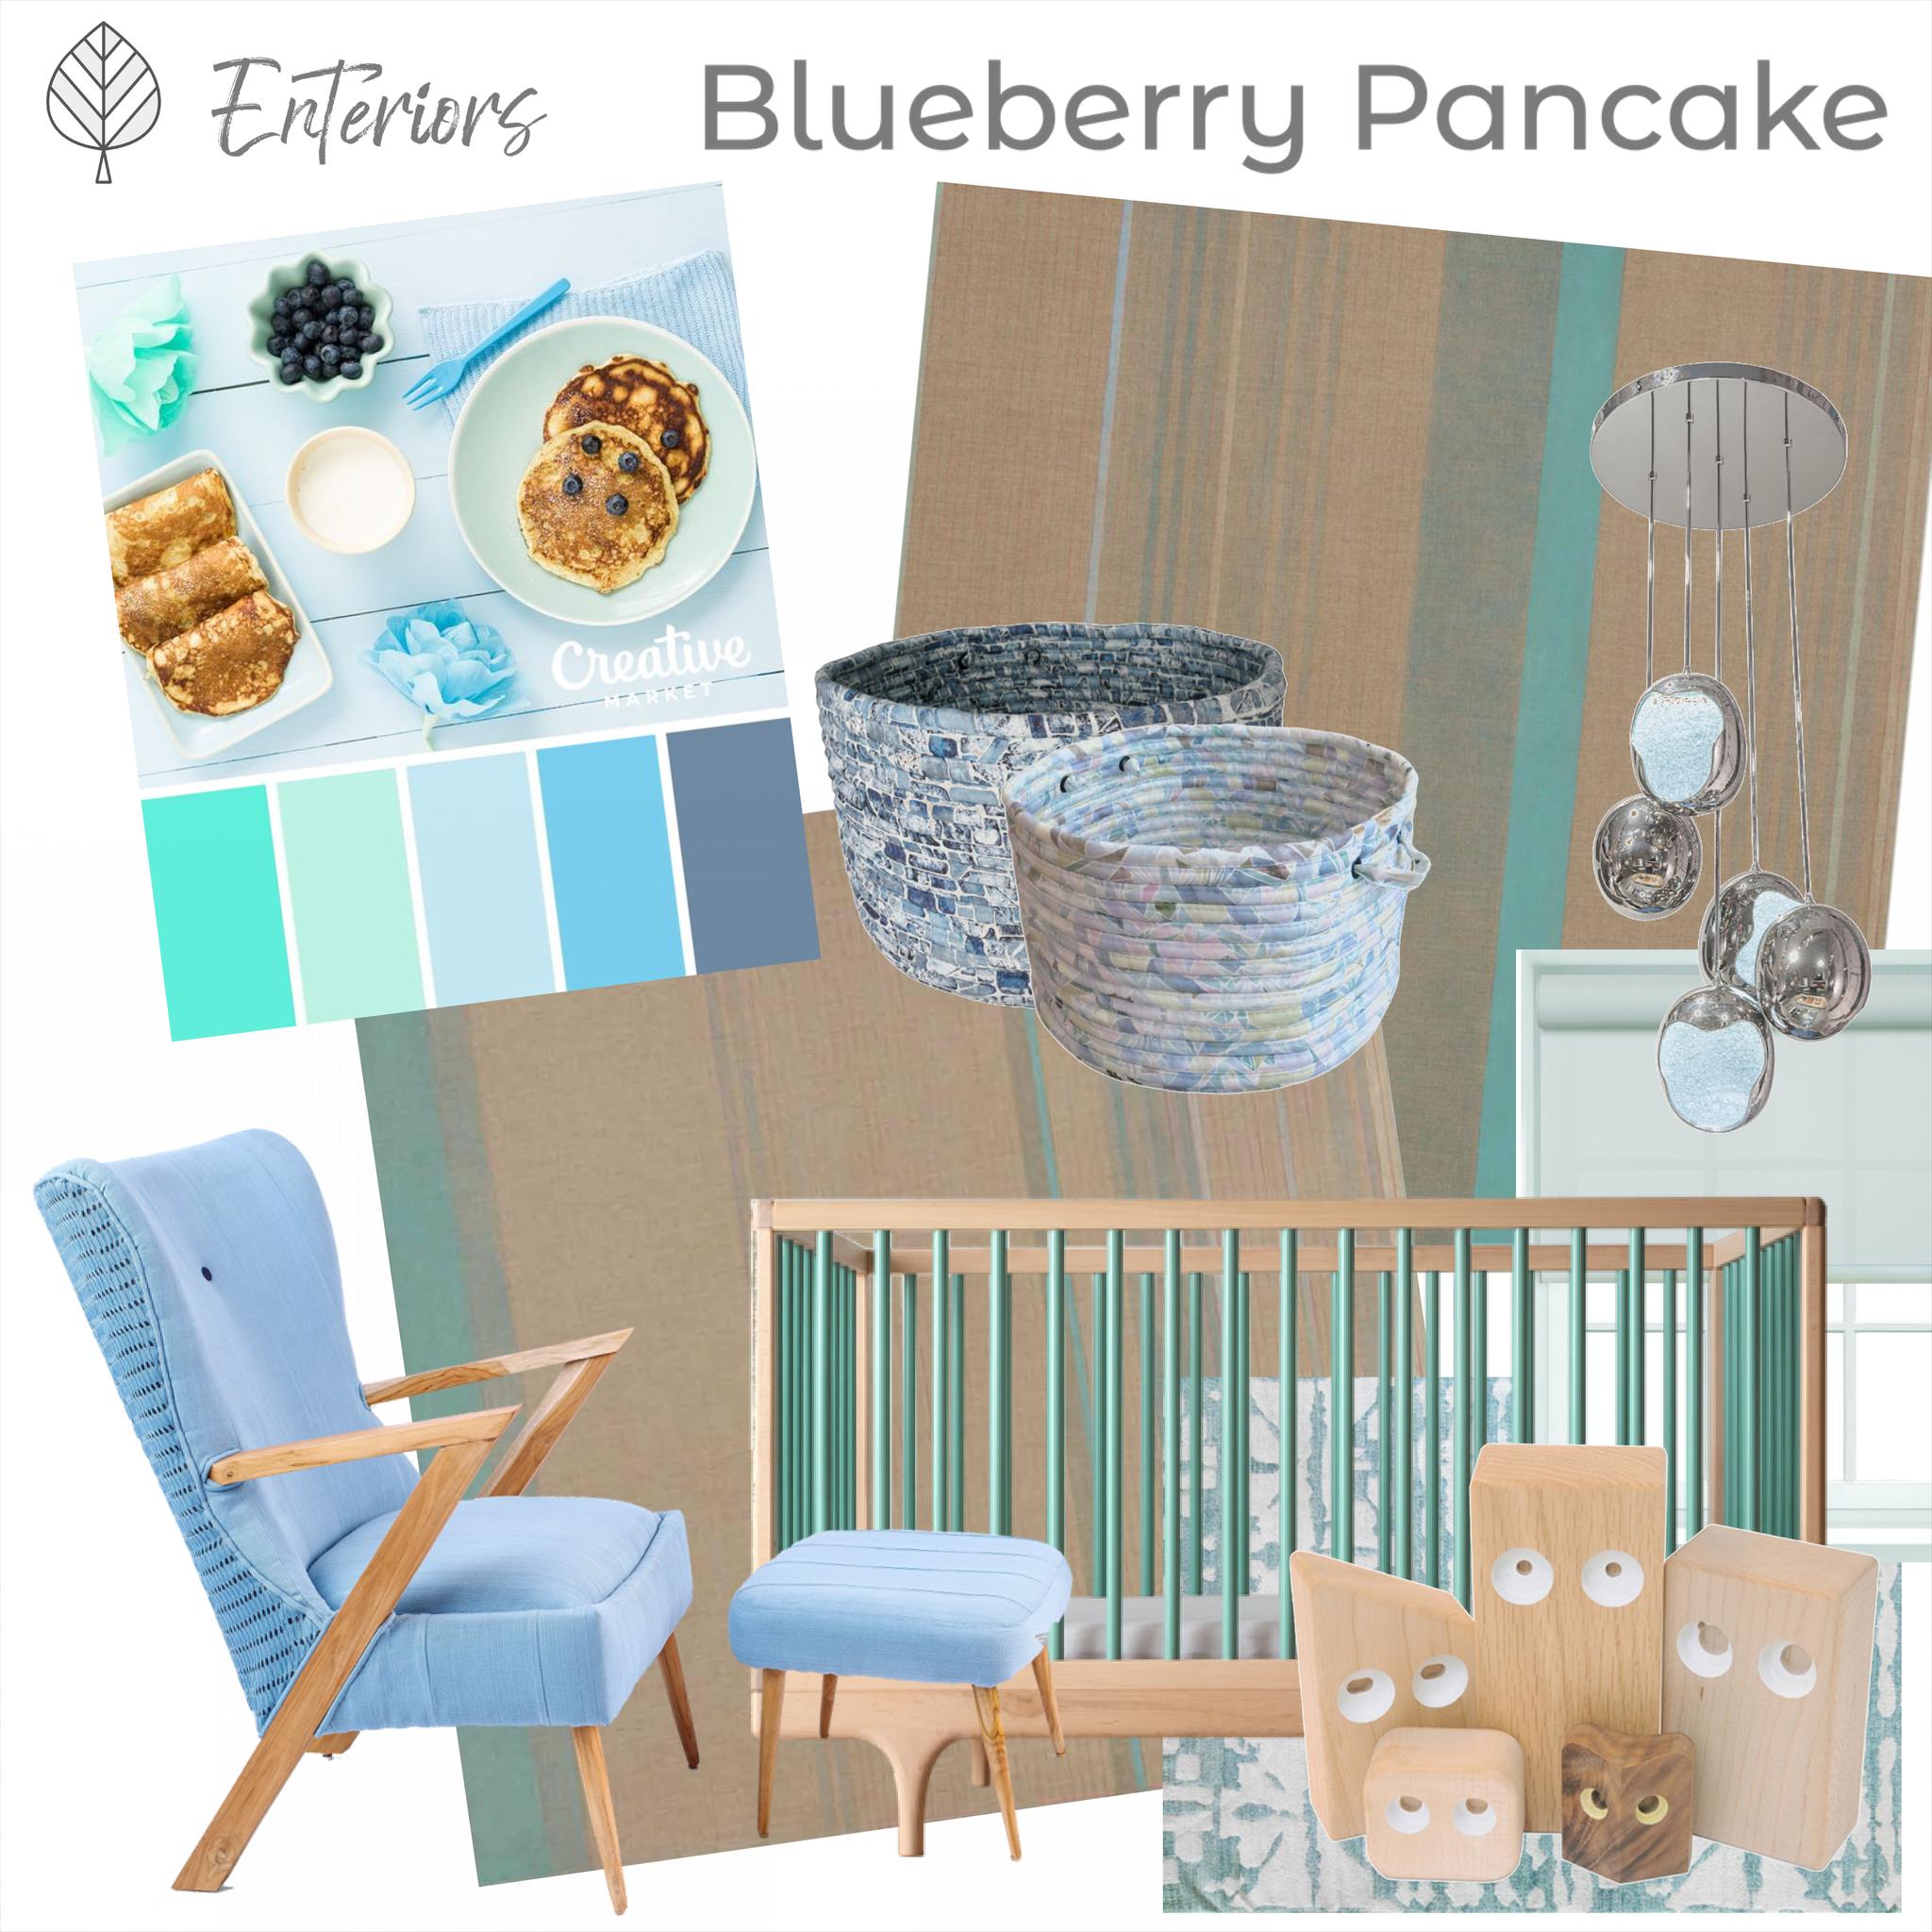 Style Board - Blueberry Pancake